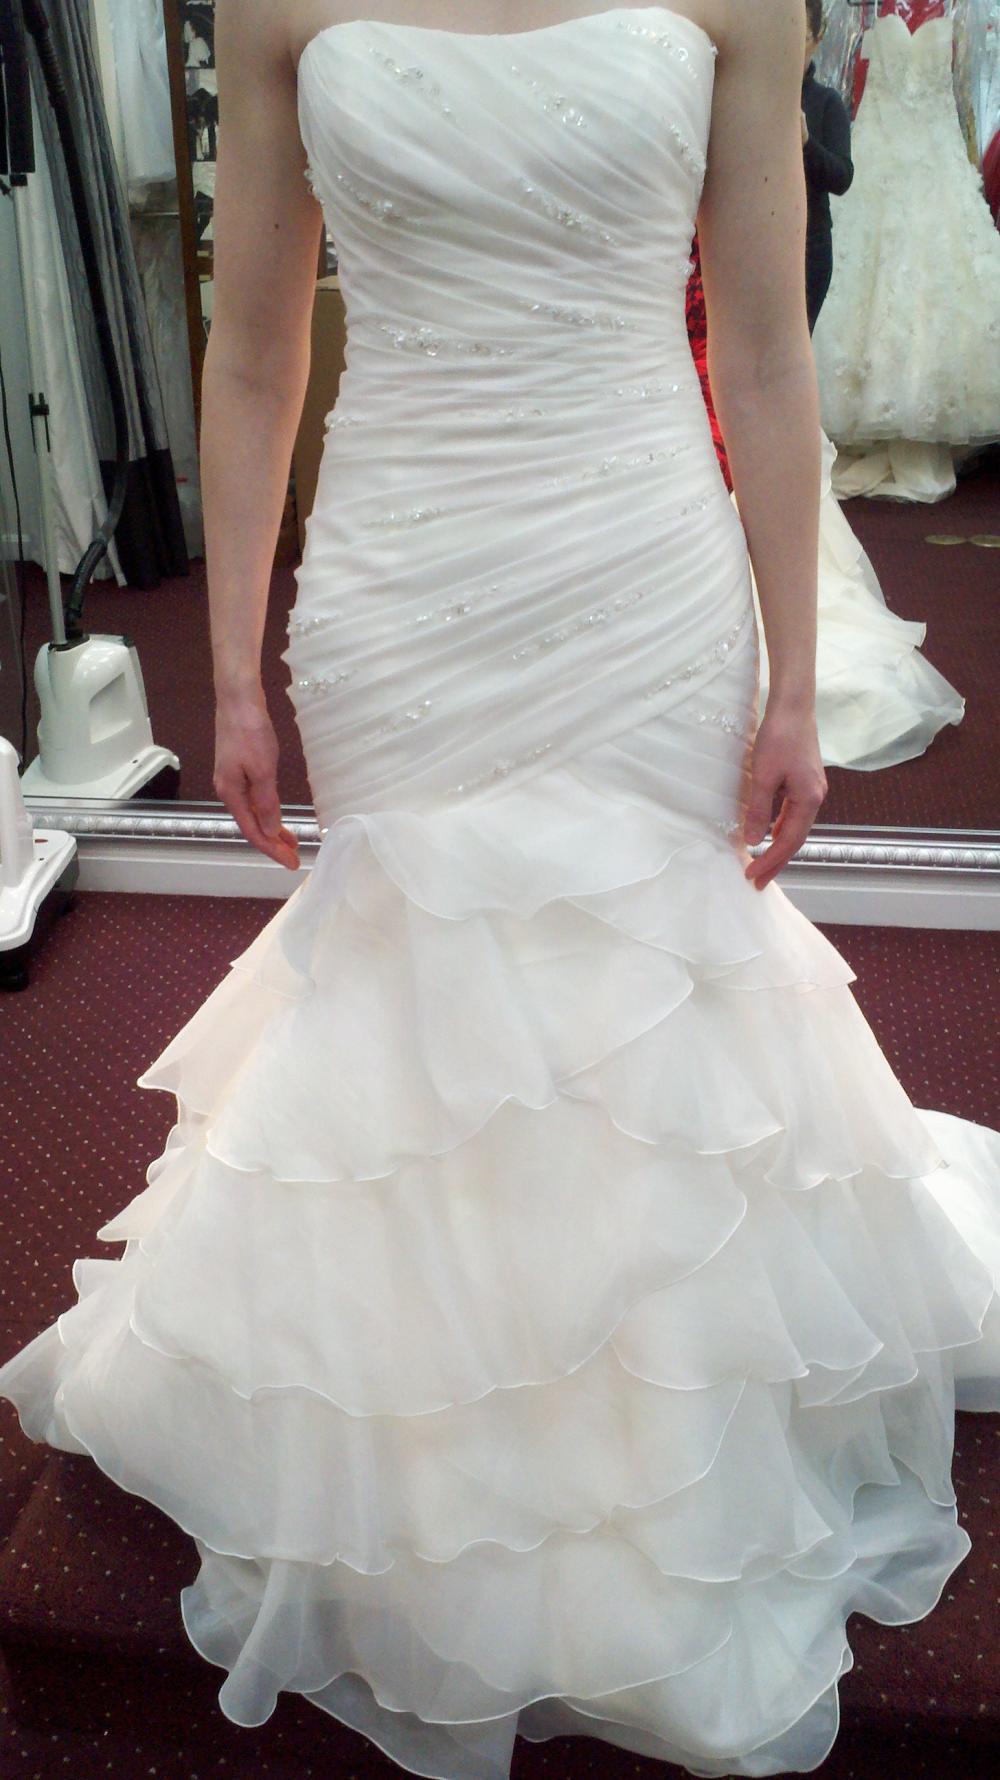 Replica Wedding Dresses - DARIUS COUTURE